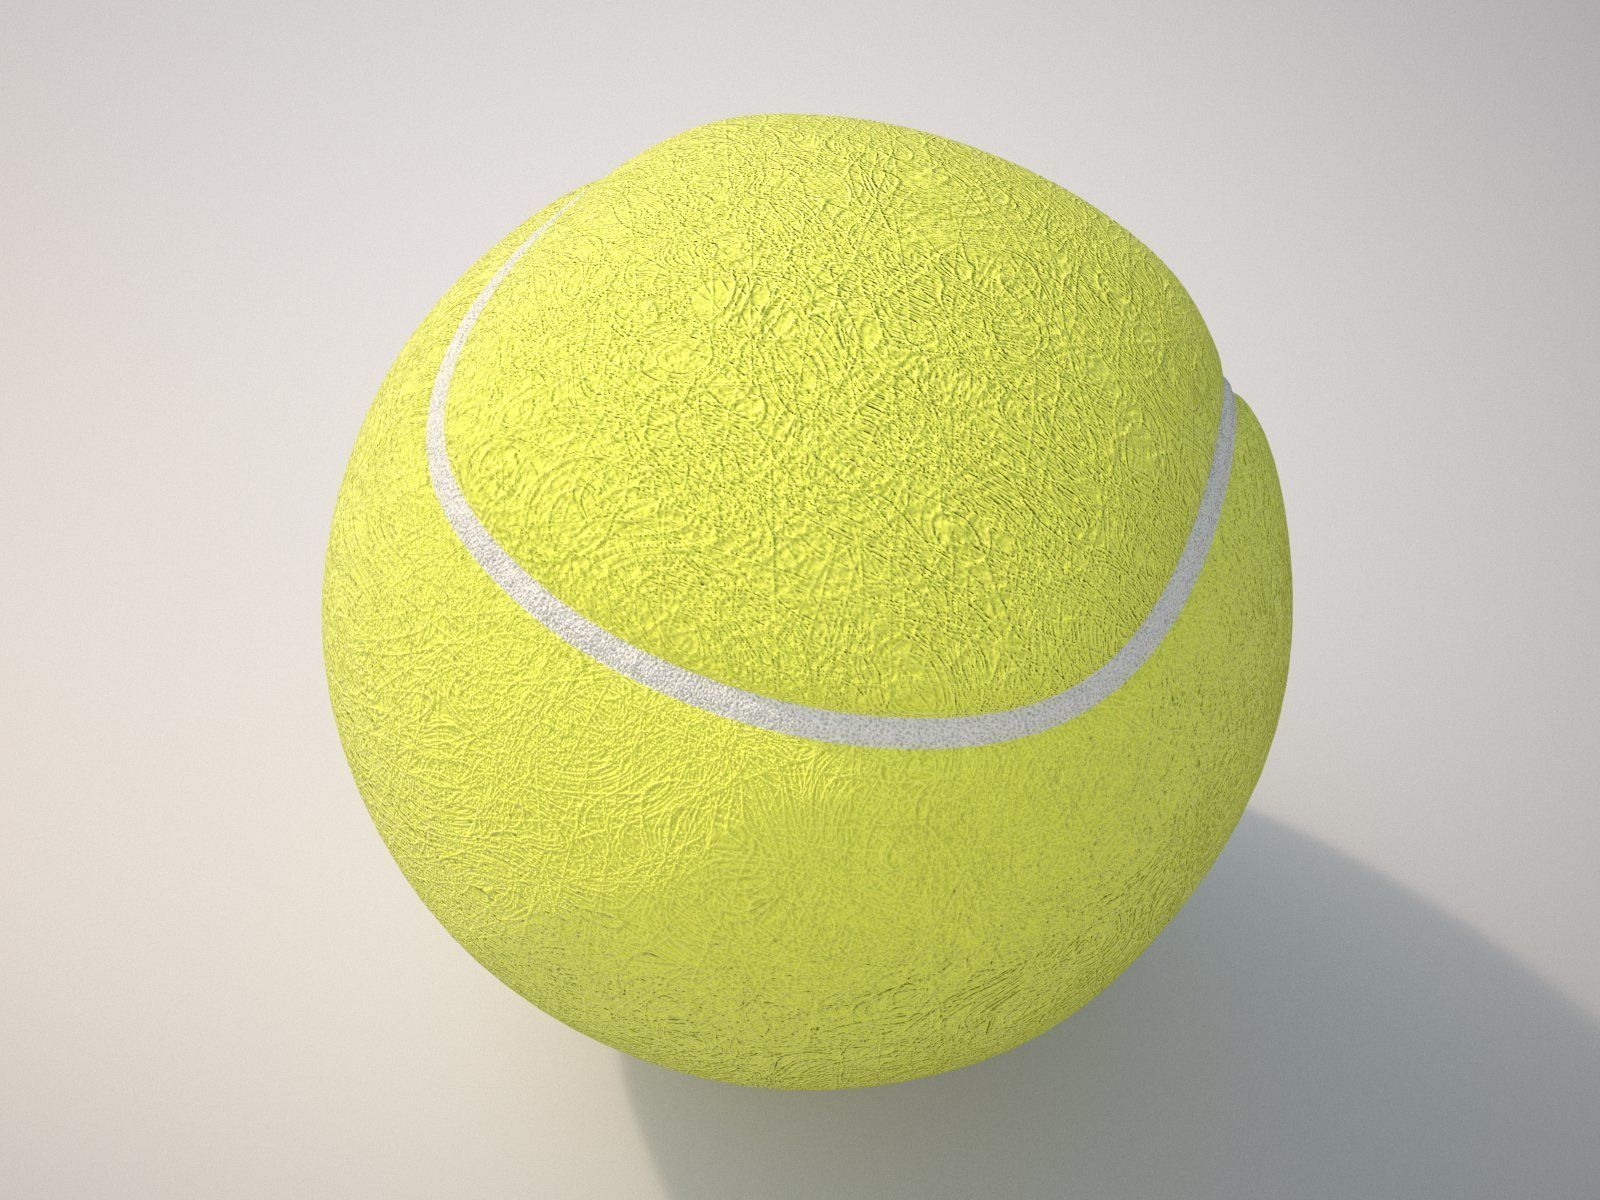 Pelota Tenis By Taa A Fuzzy Green Tennis Ball In High Definition On Openclipart Tennis Ball Tennis Ball